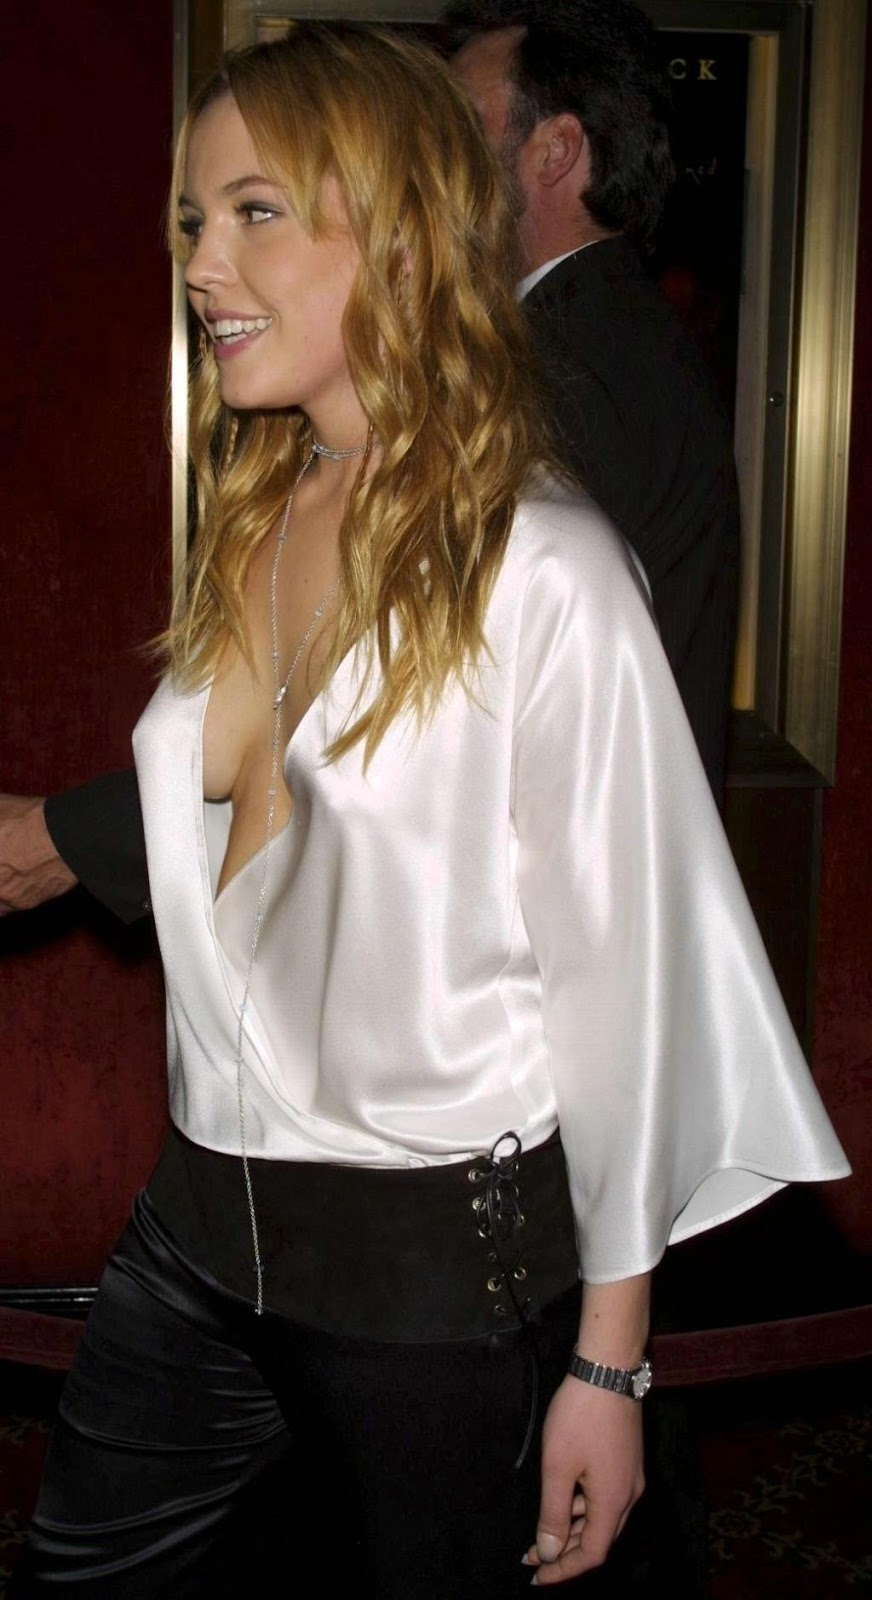 agnes bruckner seductive hot - photo #30